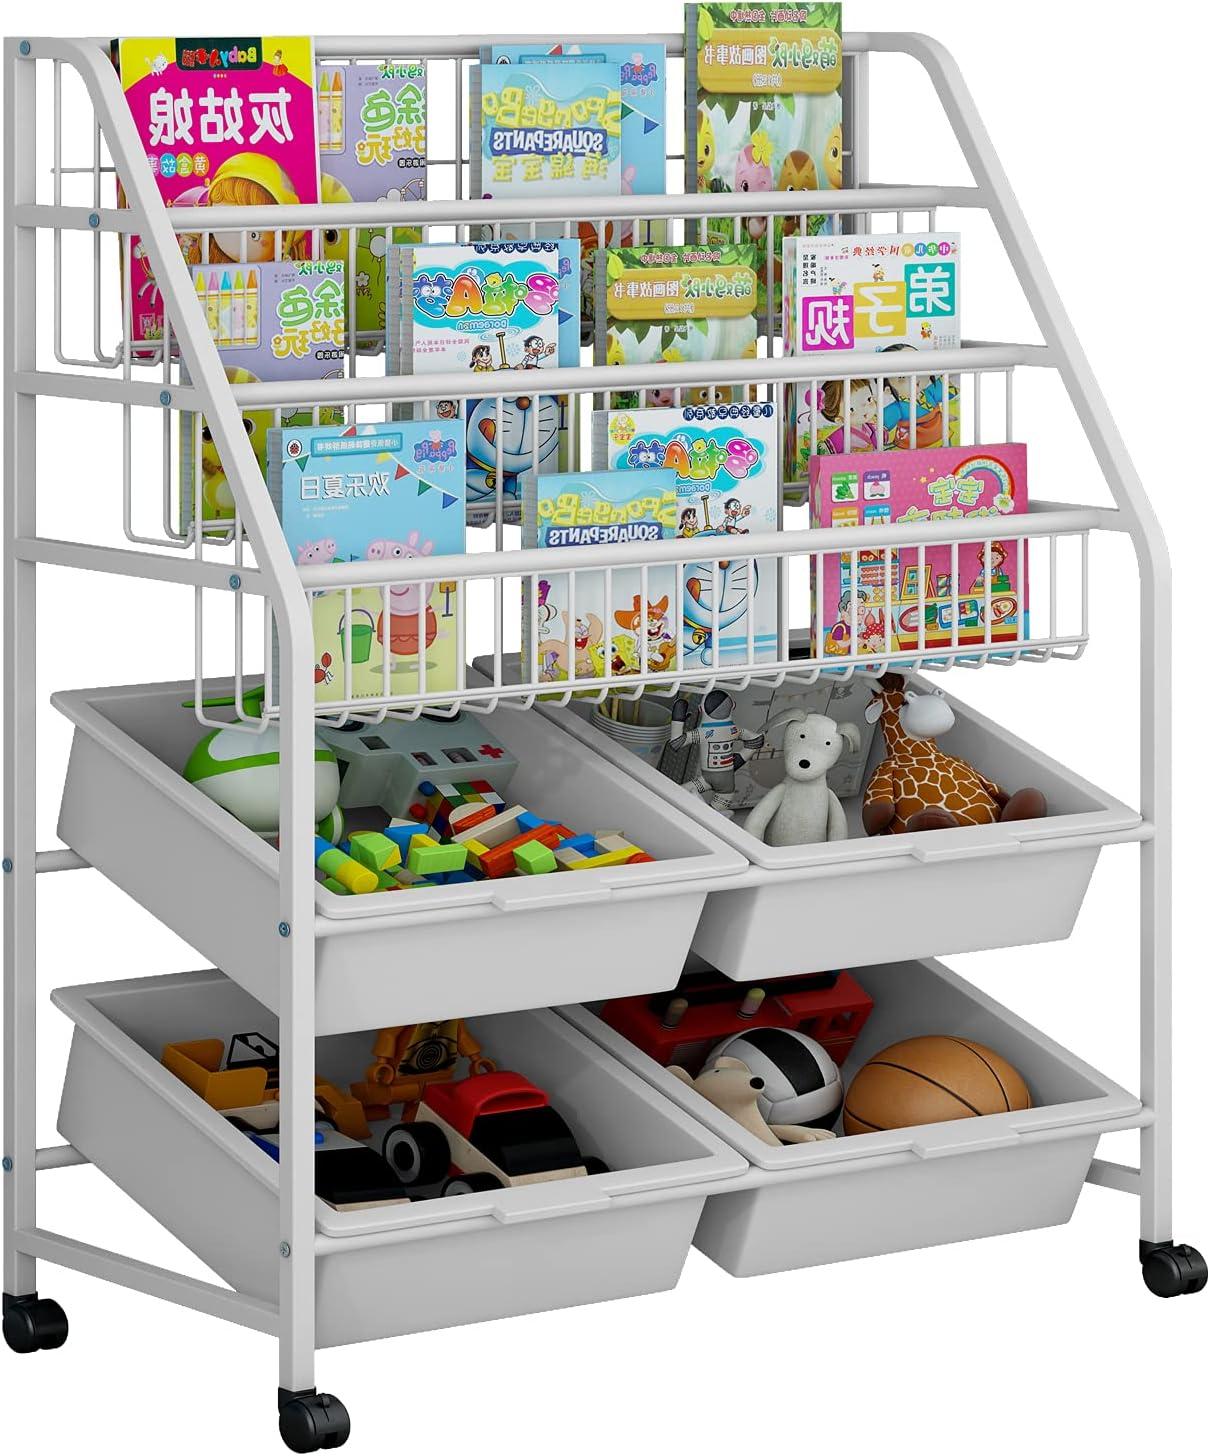 LINZINAR Bookshelf Iron Toy Organizer 3 Tier Mobile 3Tier-4Box, White